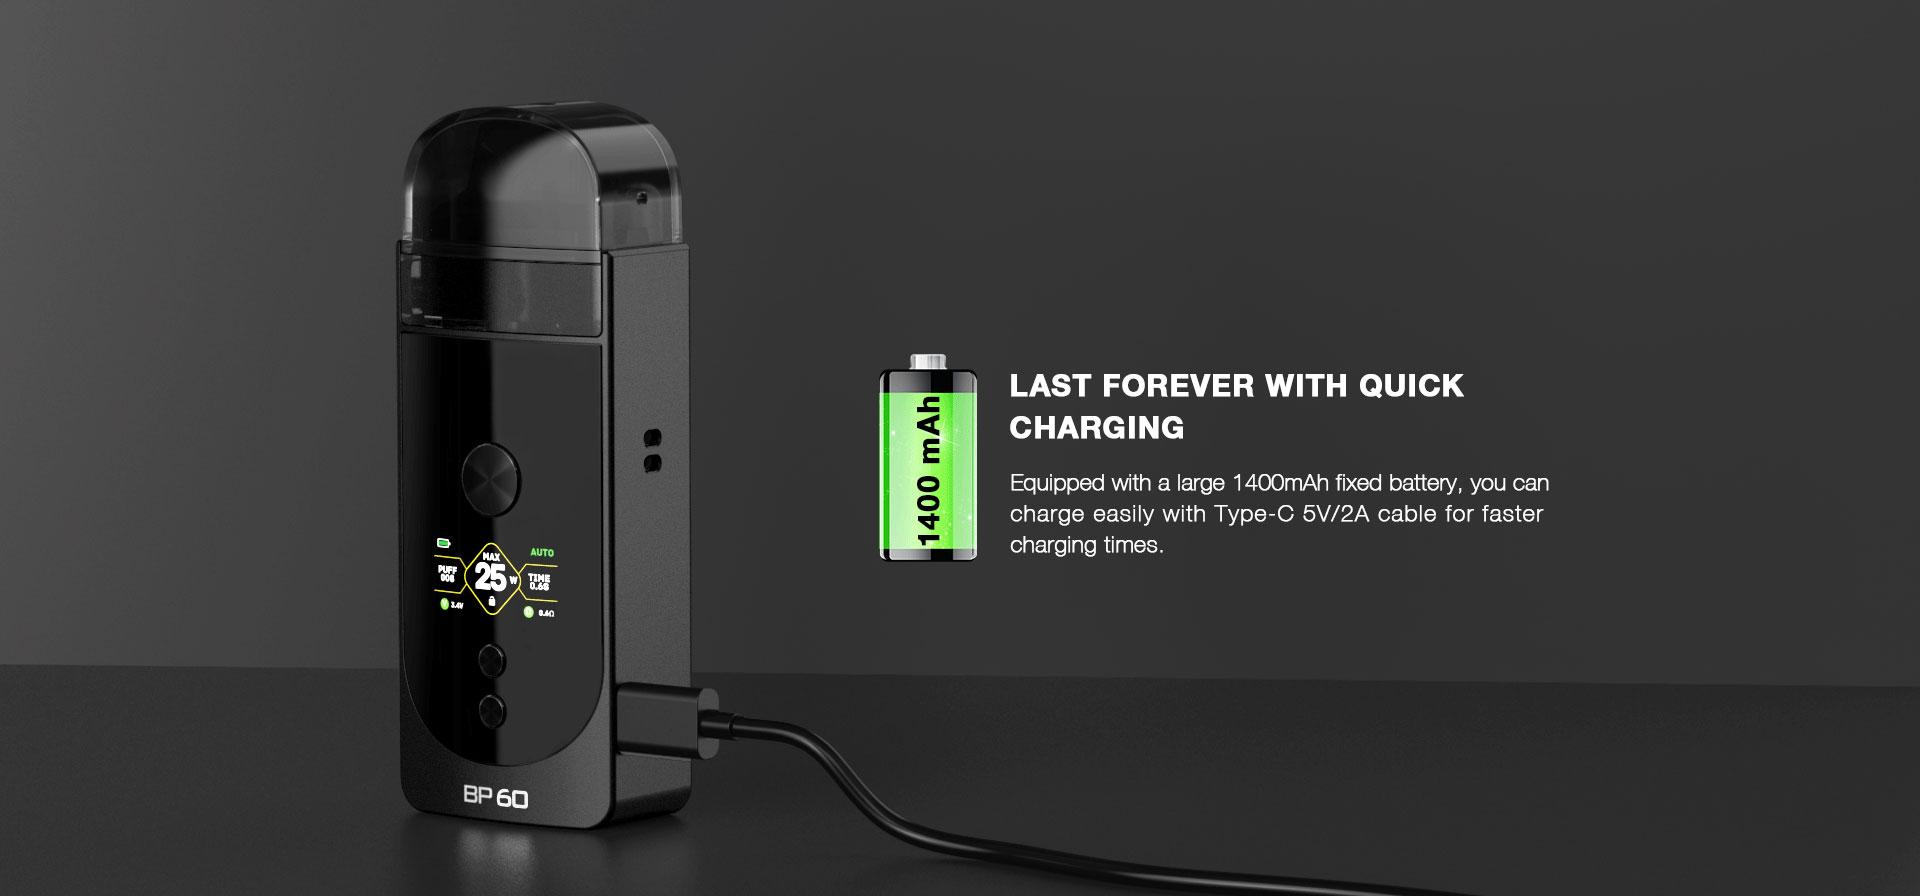 aspire-bp60-pod-kit-charging.jpg